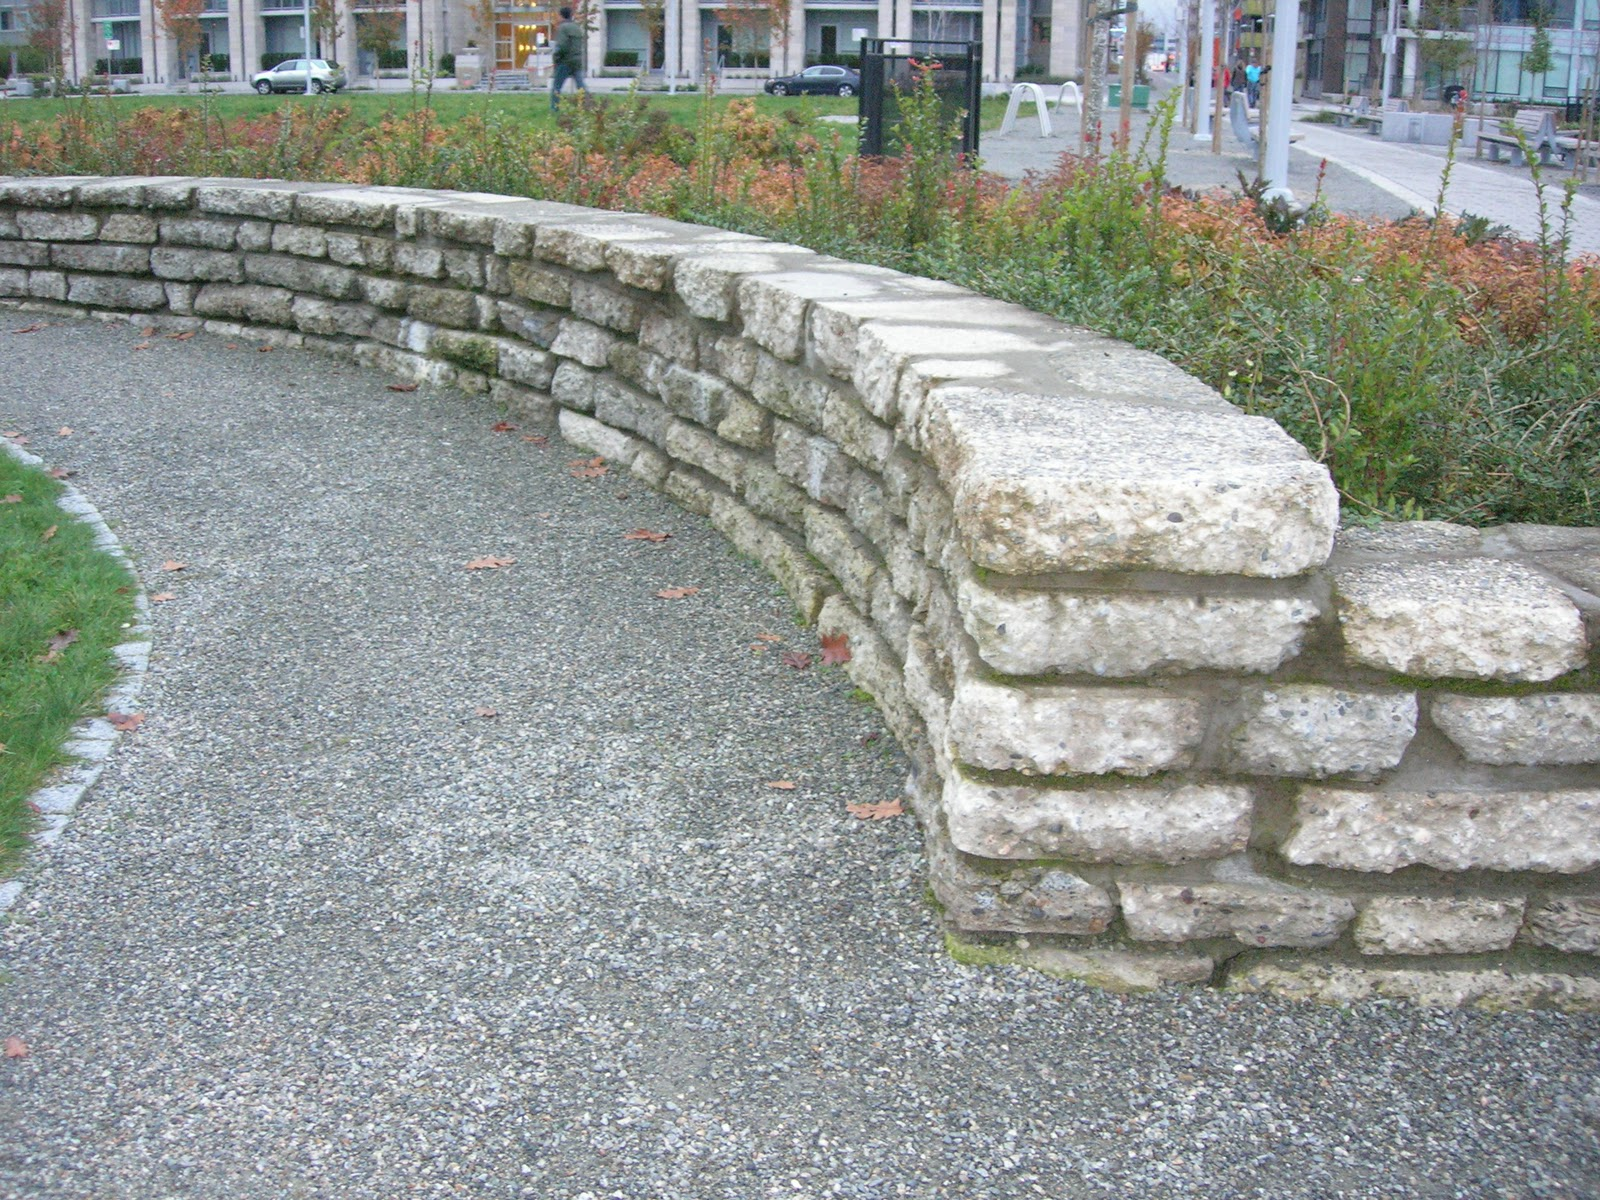 Hastings school playground design urbanite repurposed for Landscaping rocks northern virginia